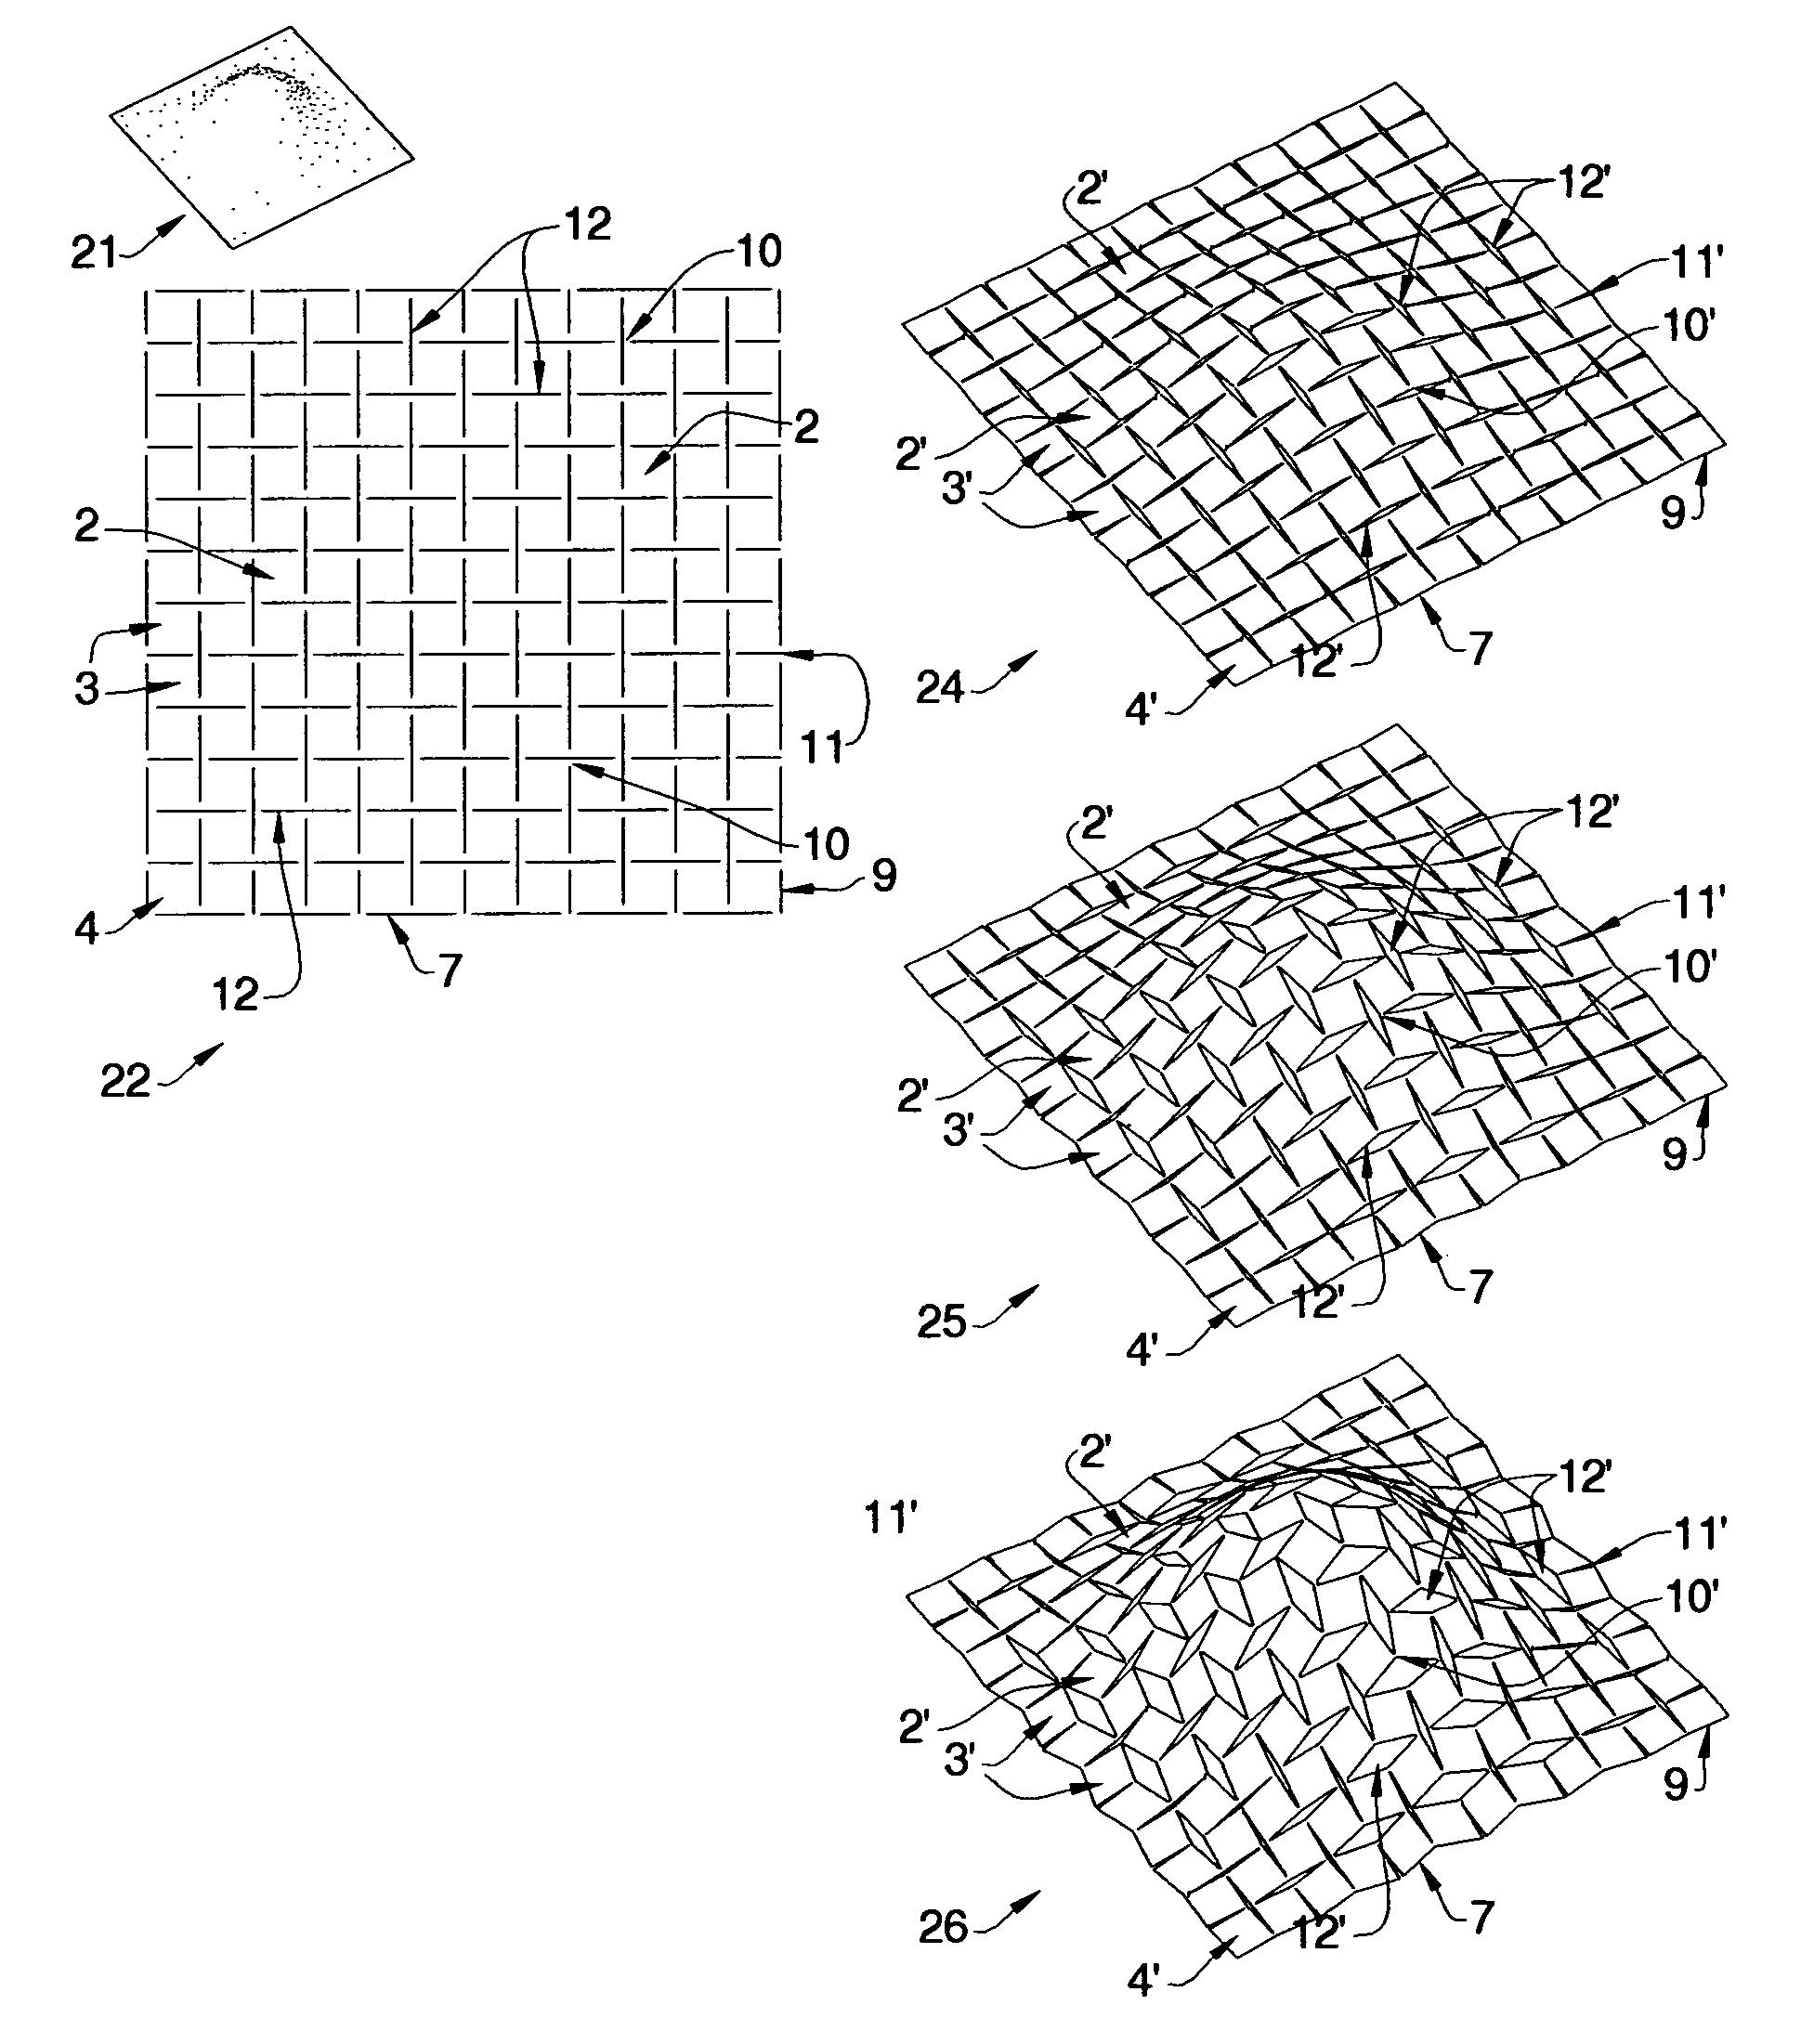 Warwick Bass Wiring Diagram Aguilar Obp 3 And Schematics